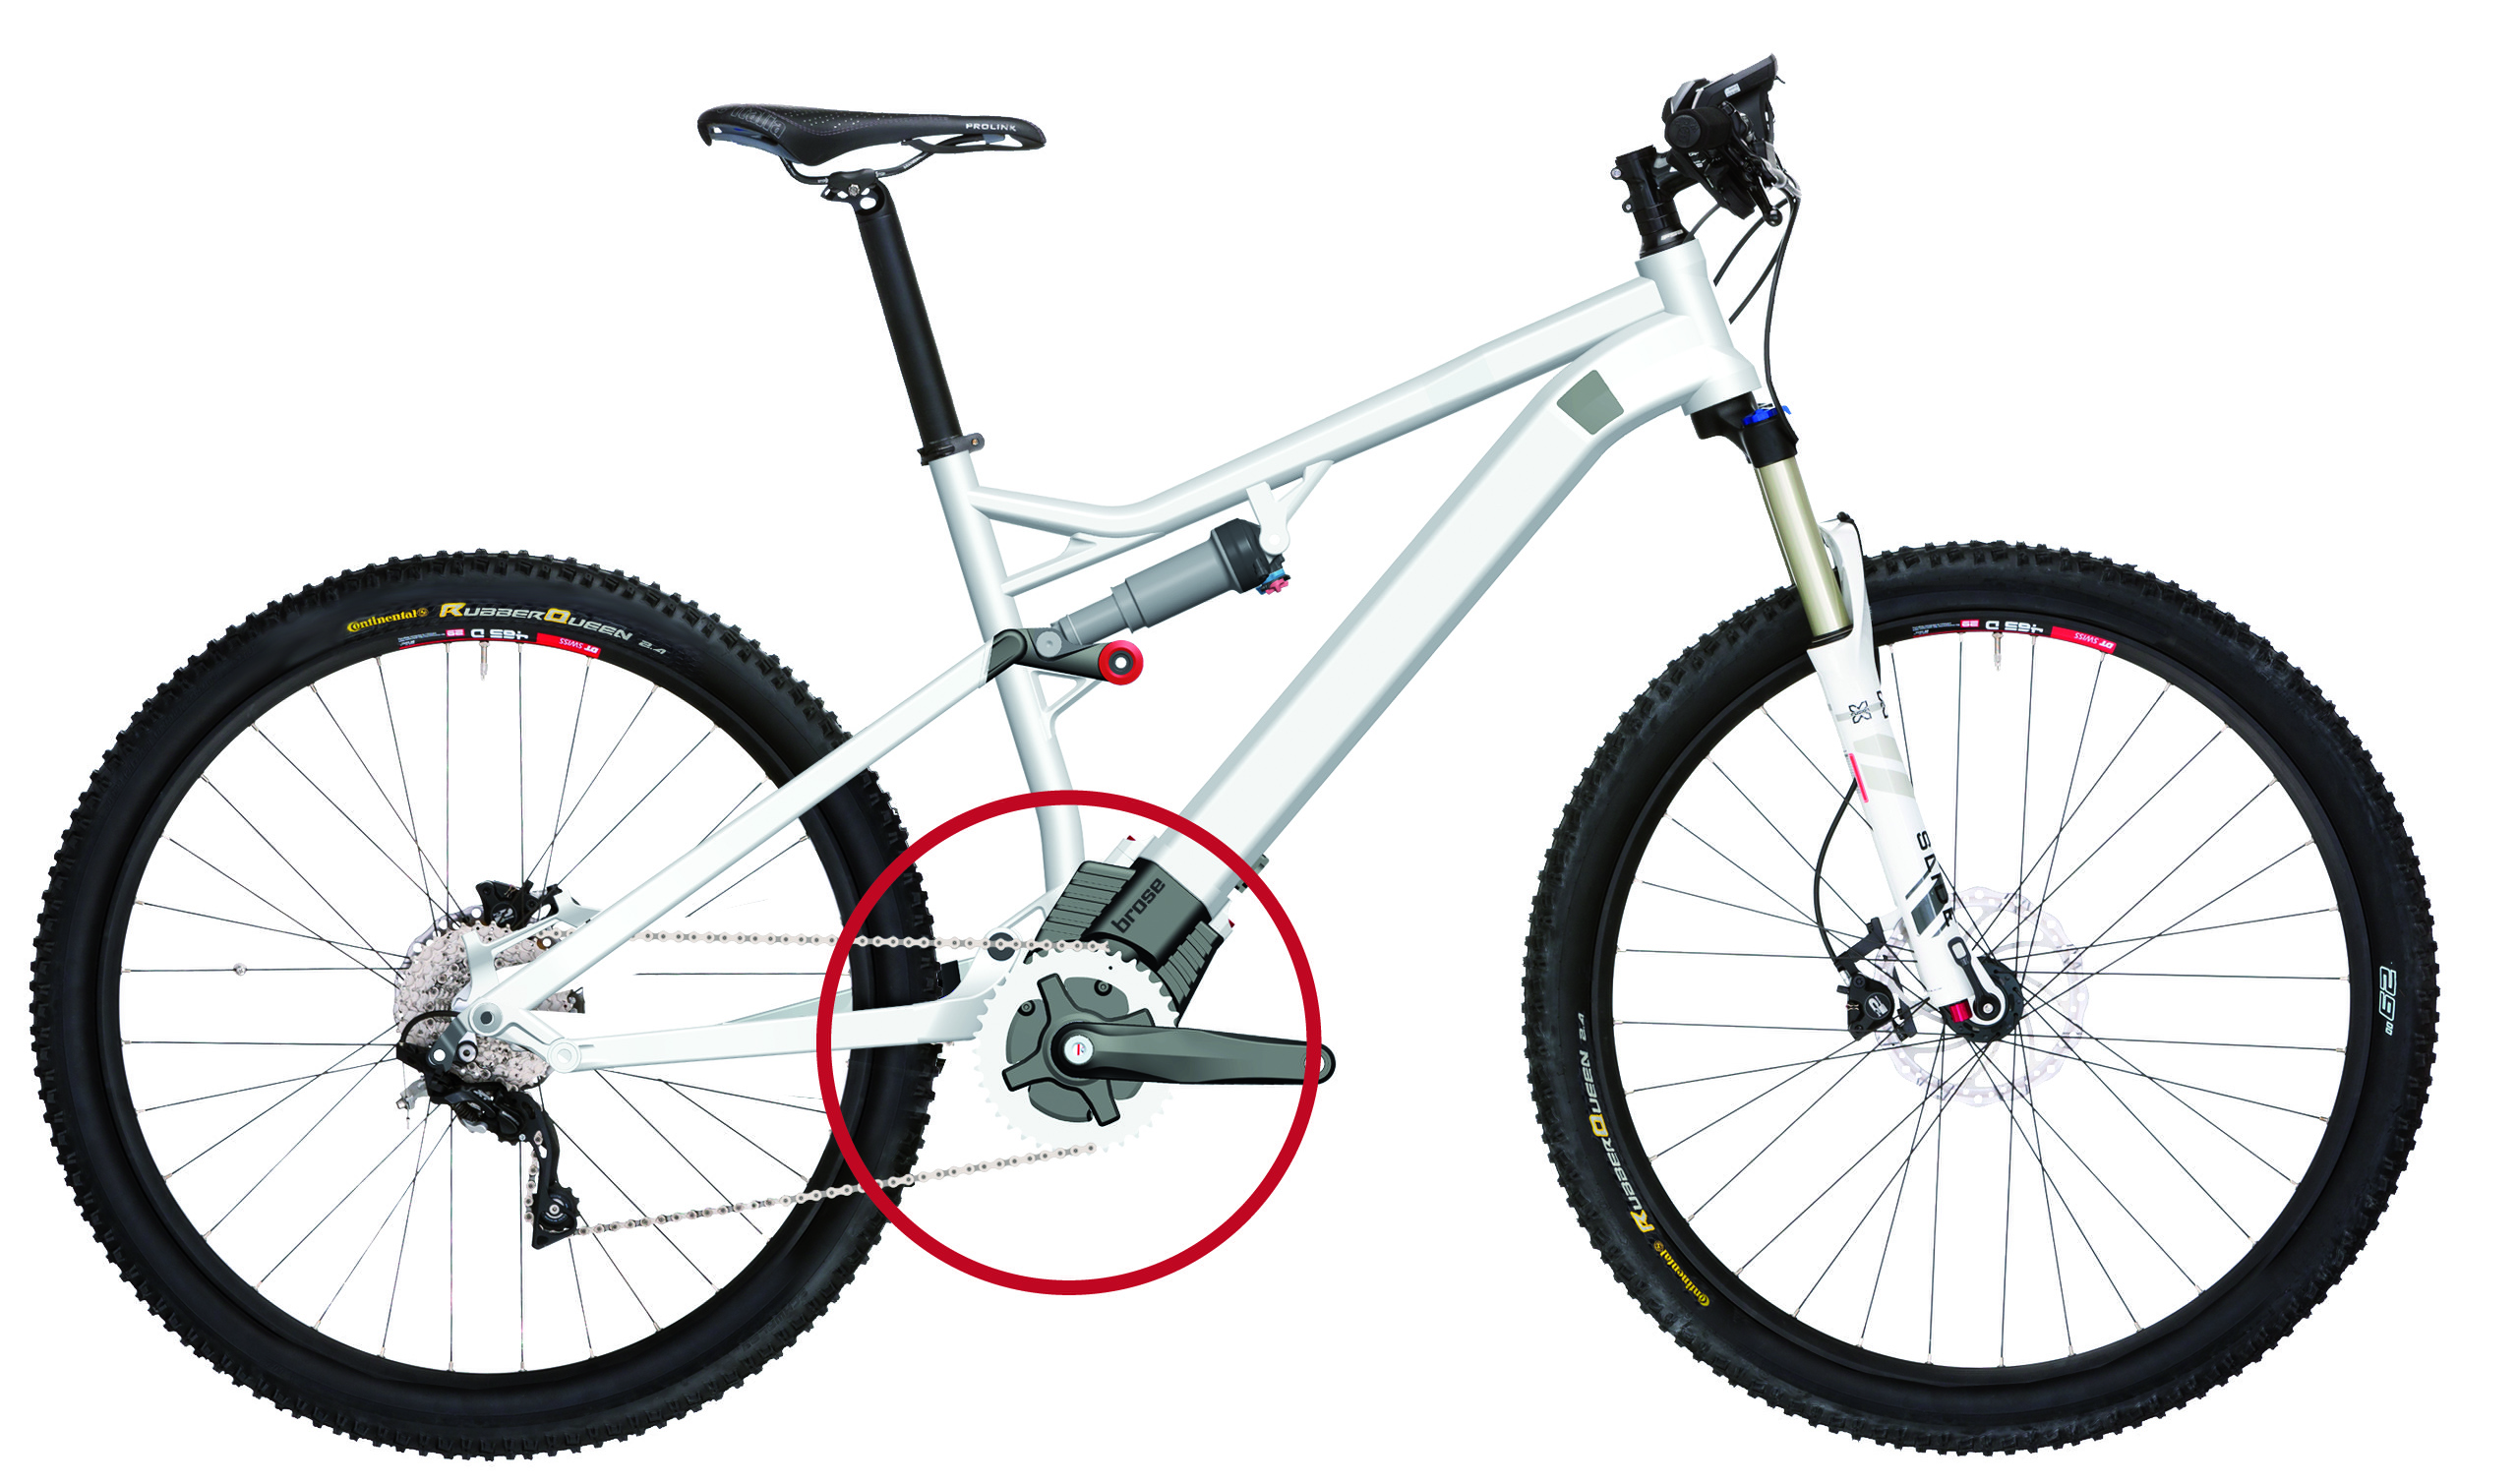 eurobike 2013 brose stellt e bike antrieb vor. Black Bedroom Furniture Sets. Home Design Ideas